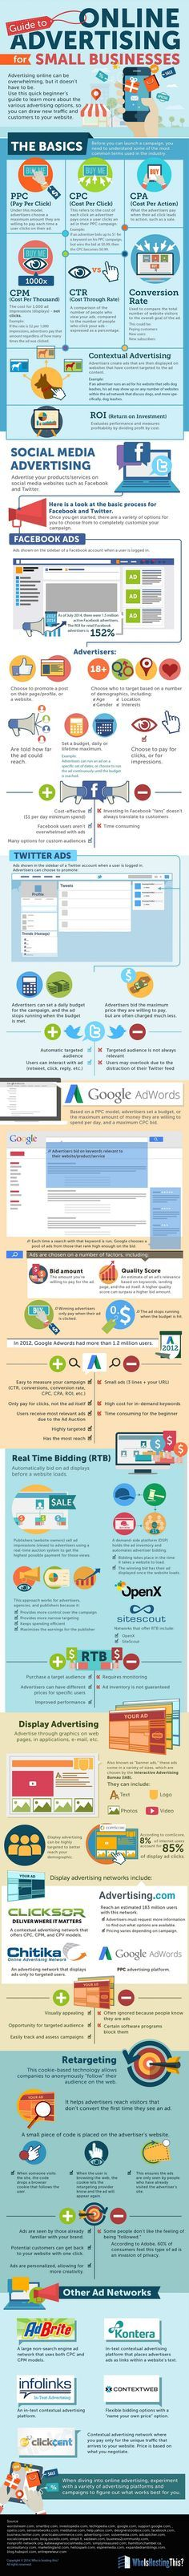 Guide To #OnlineAdvertising For Small Businesses - #Socialmediamarketing #infografía